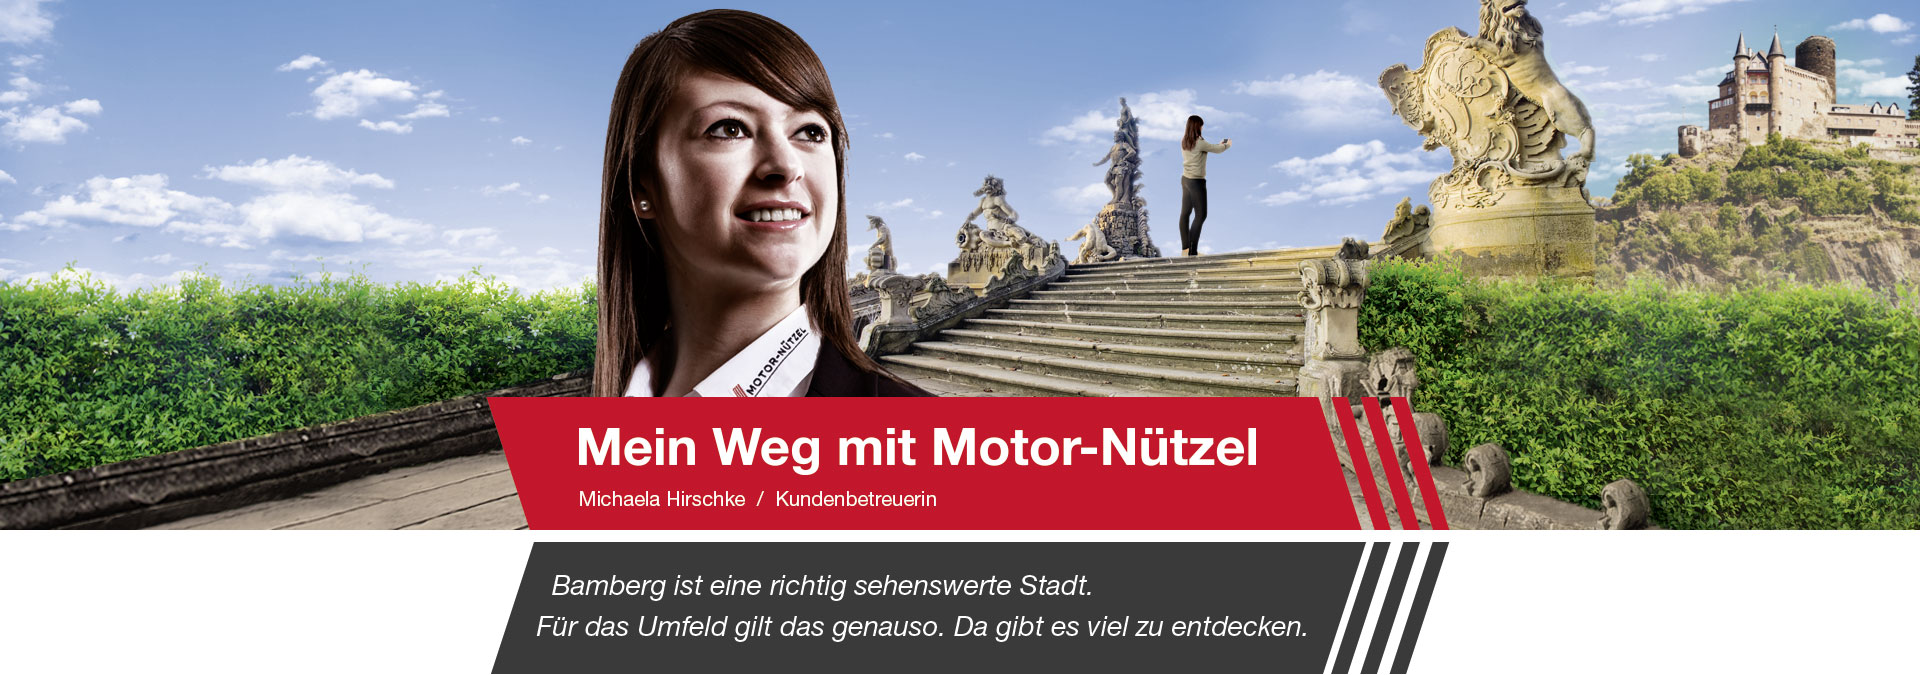 Michaela Hirschke ist Kundenbetreuerin bei Motor-Nützel